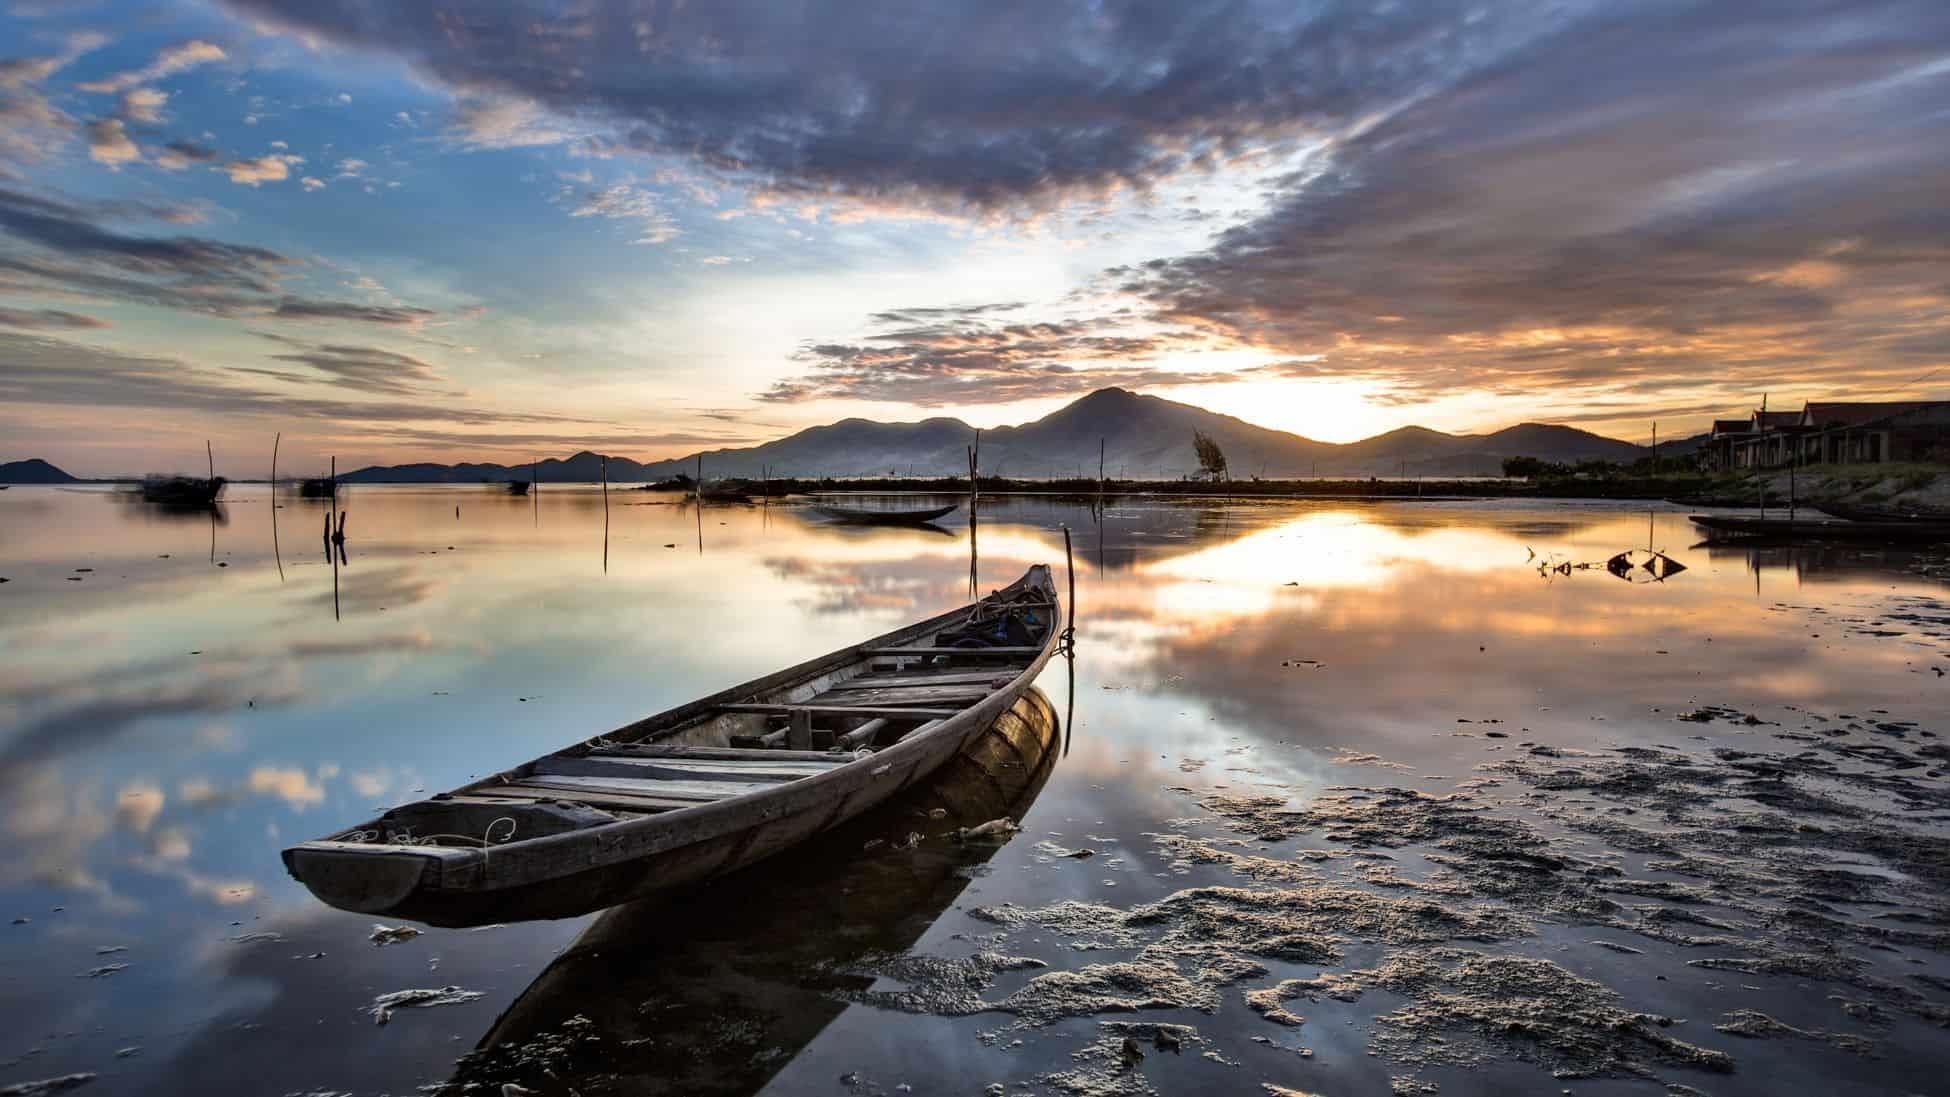 Sunrise on Tam Giang Lagoon Half-day Tour